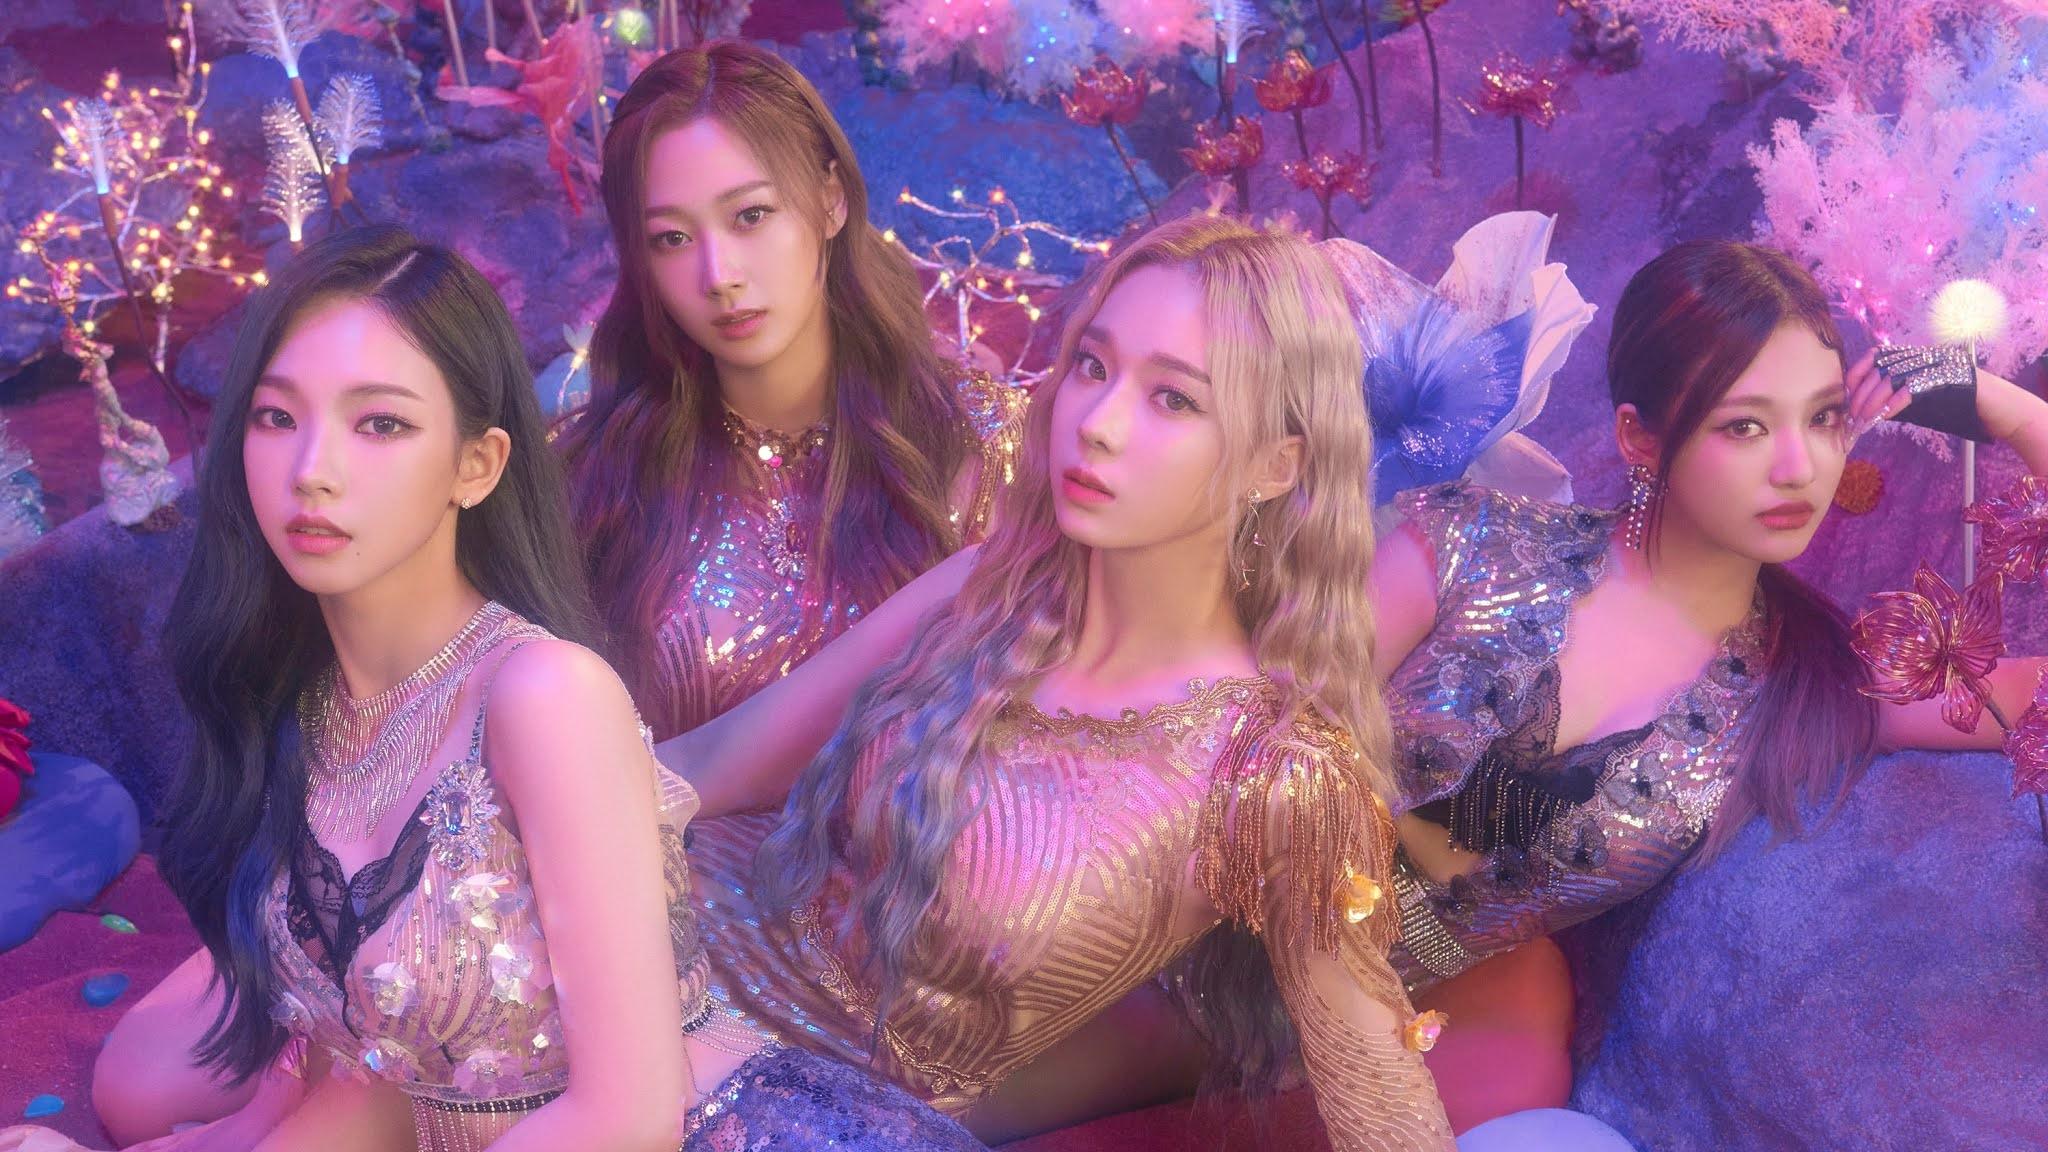 SM Entertainment Announces aespa's Debut Schedule with Single 'Black Mamba'